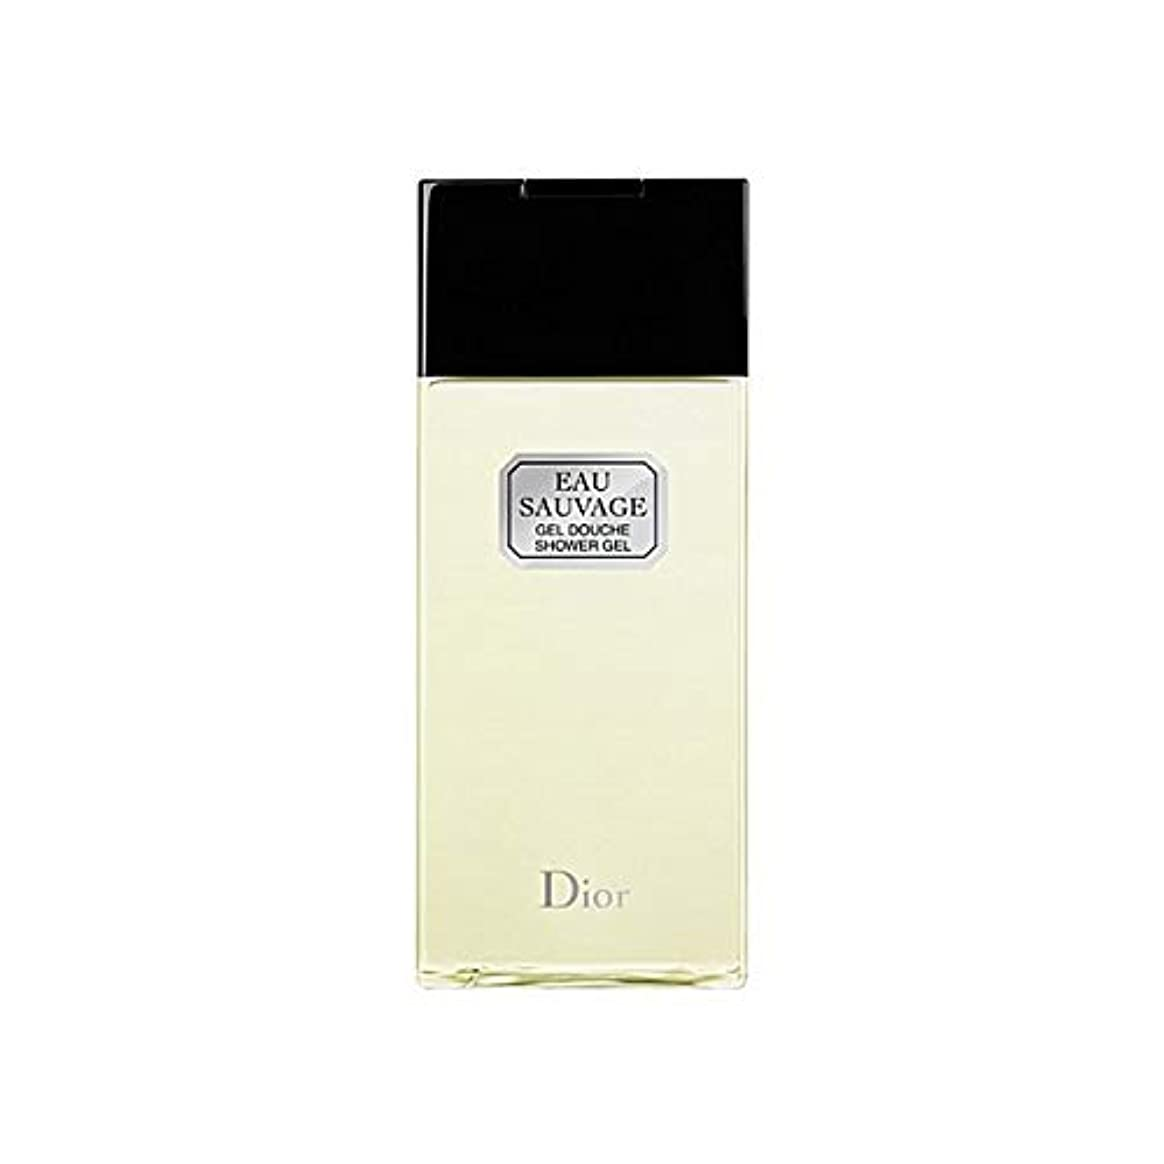 [Dior ] ディオールオーソバージュシャワージェル200Ml - Dior Eau Sauvage Shower Gel 200ml [並行輸入品]